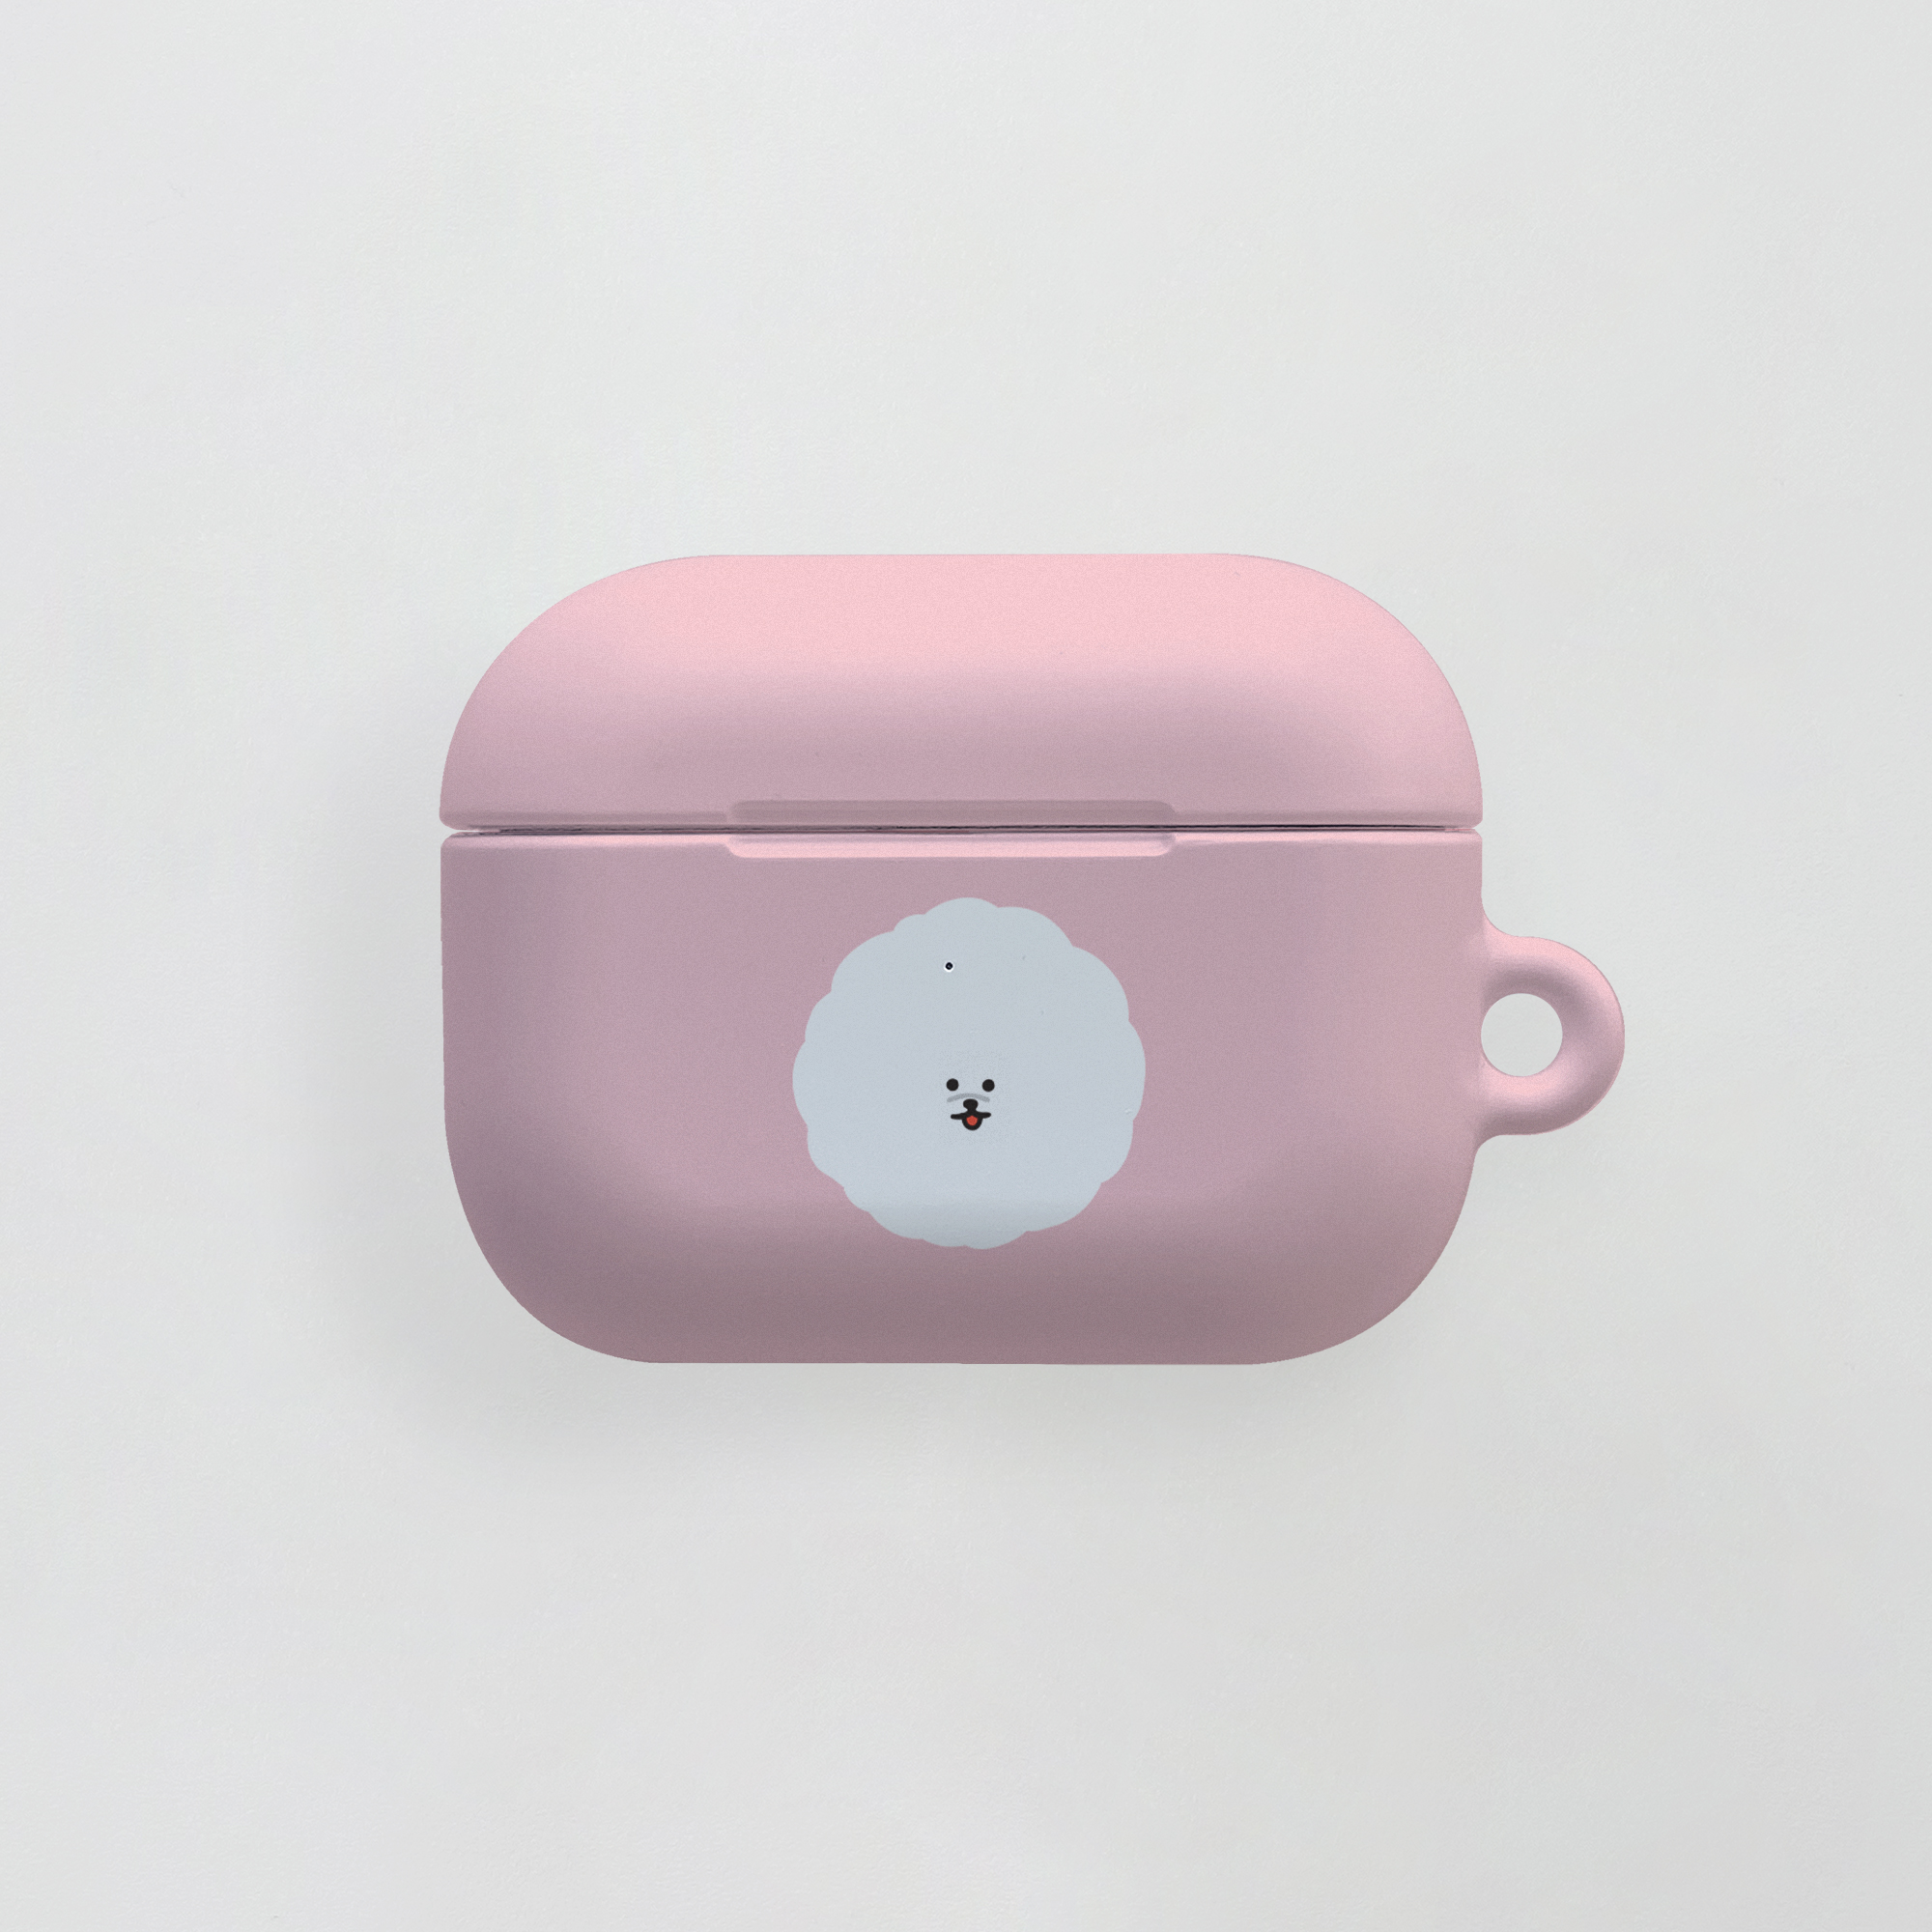 air pro) 몽글몽글 핑크